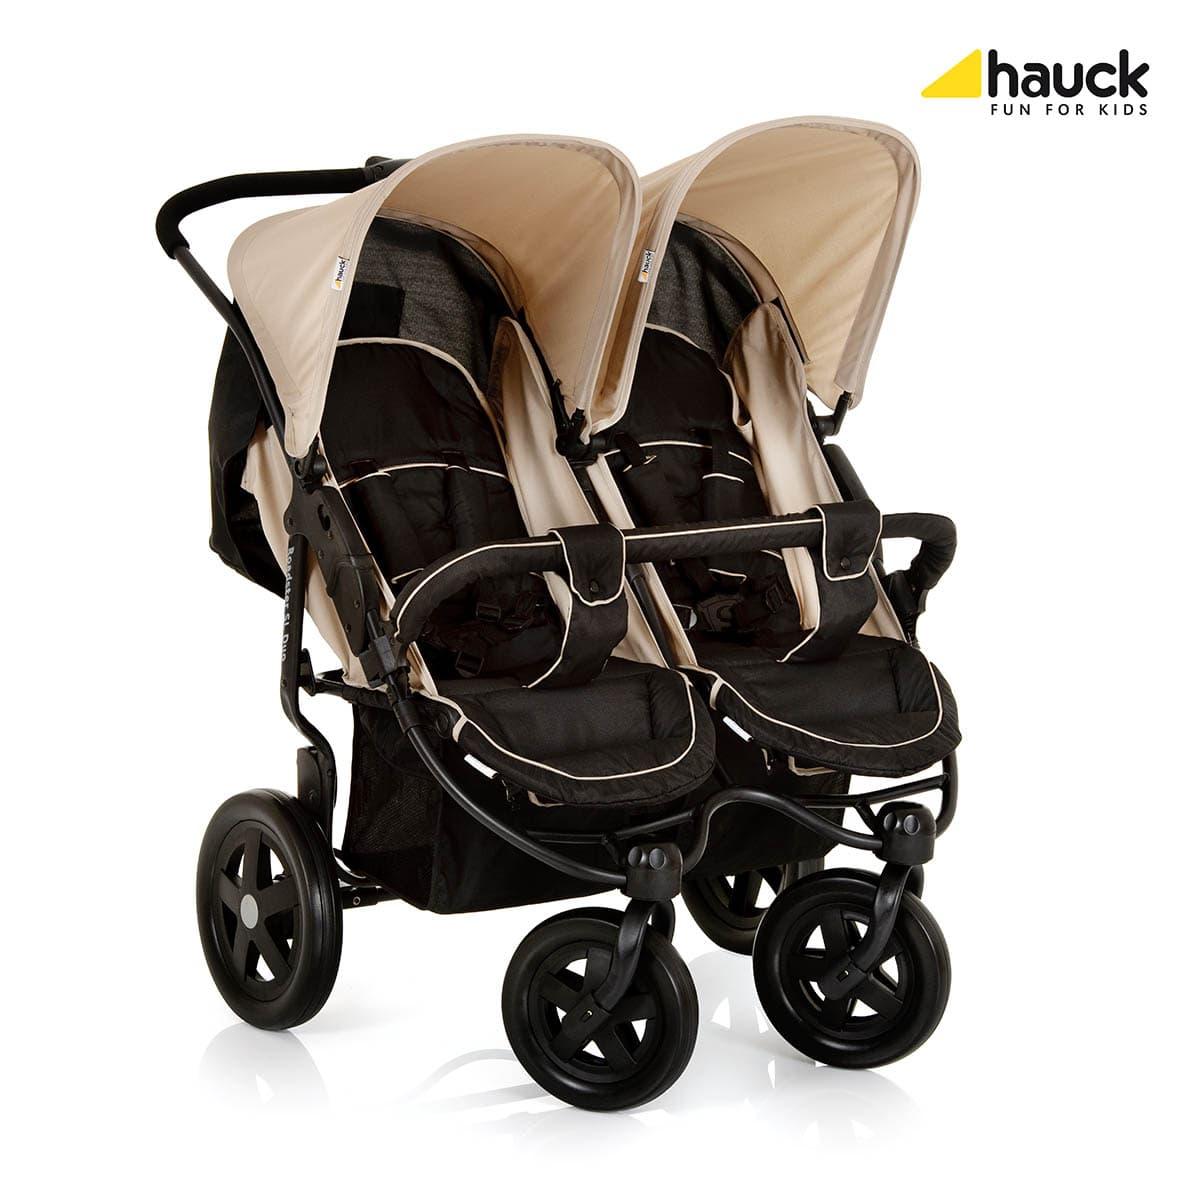 Hauck-Бебешка количка за близнаци Roadster Duo Sl